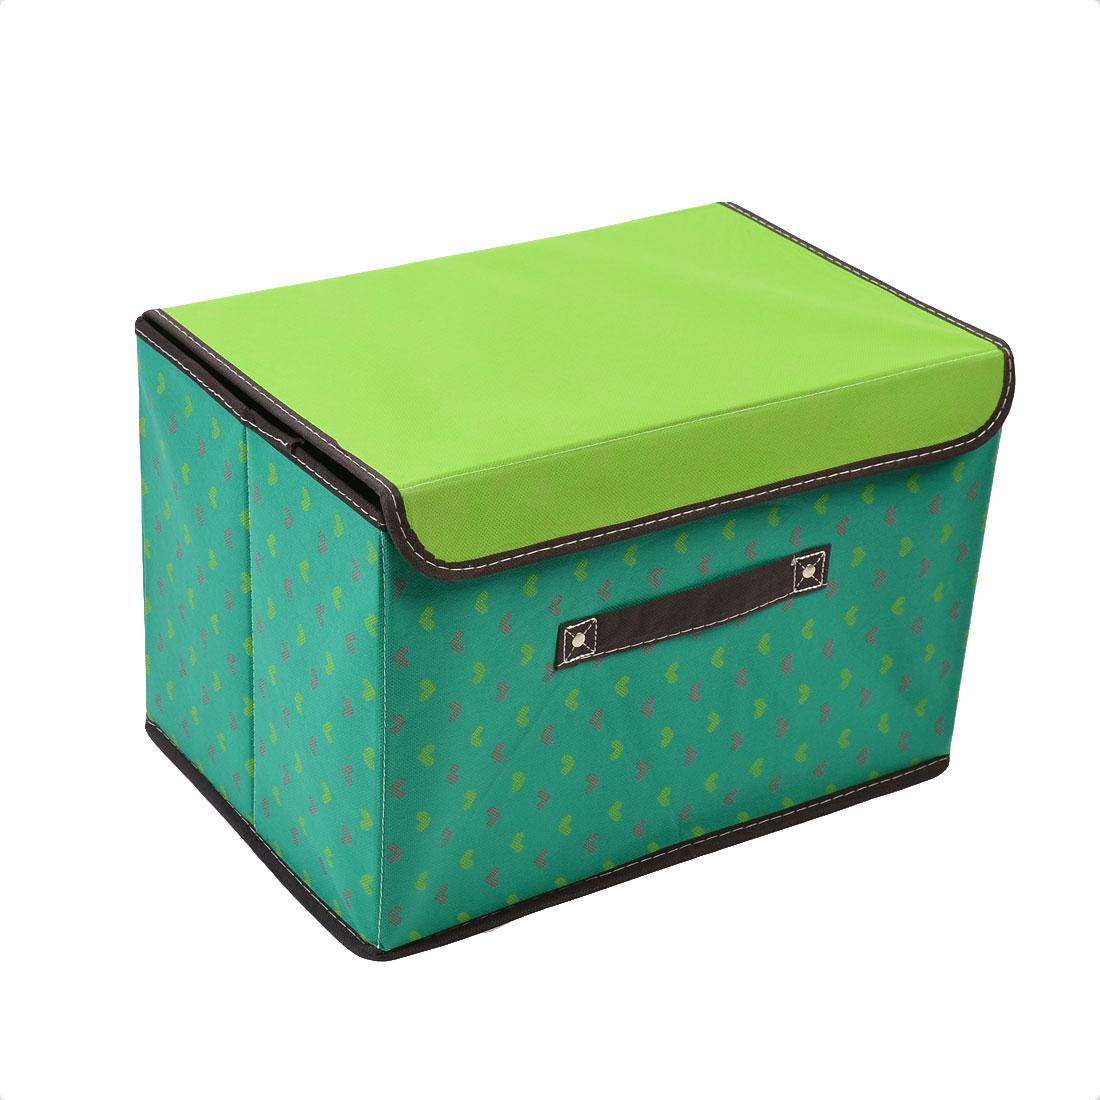 Non-woven Fabric Heart Pattern Cosmetic Storage Box Green 38cm x 25cm x 25cm